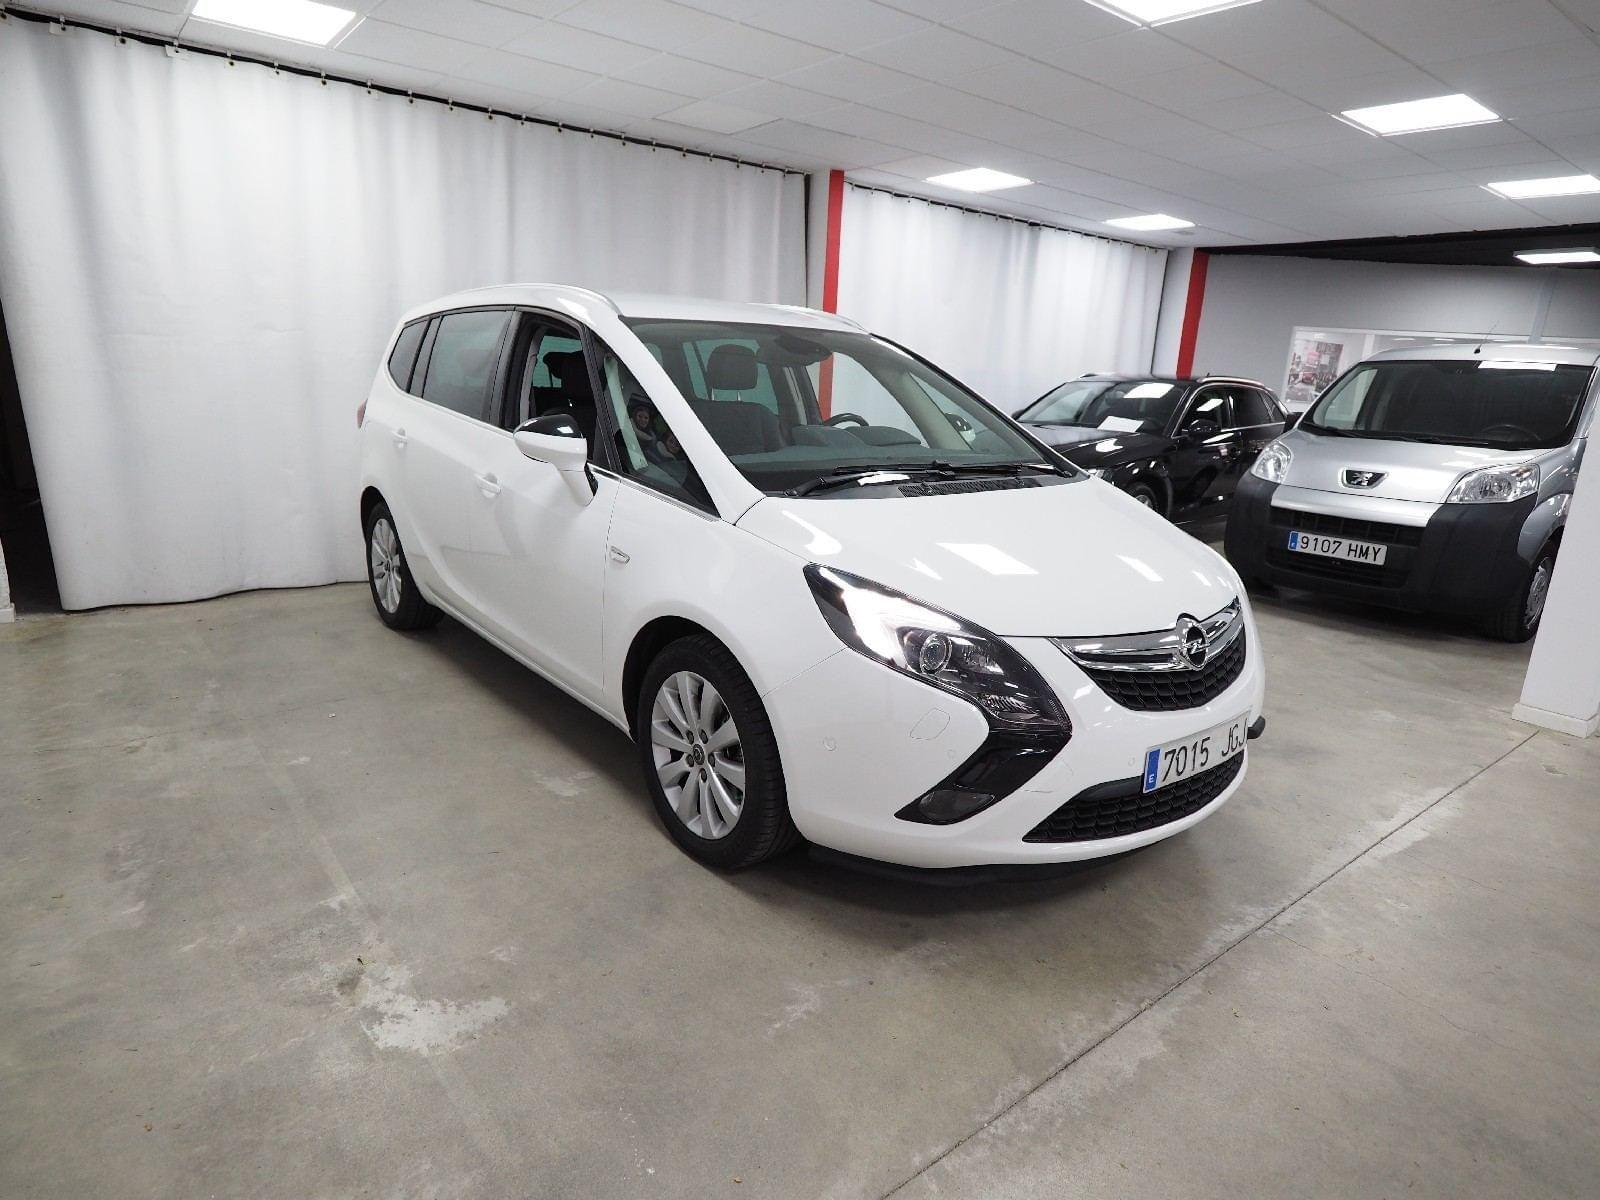 2018 2019 Opel Zafira Tourer New Minivan From 2018 2019 Opel Chrysler Cars Opel Vw Diesel